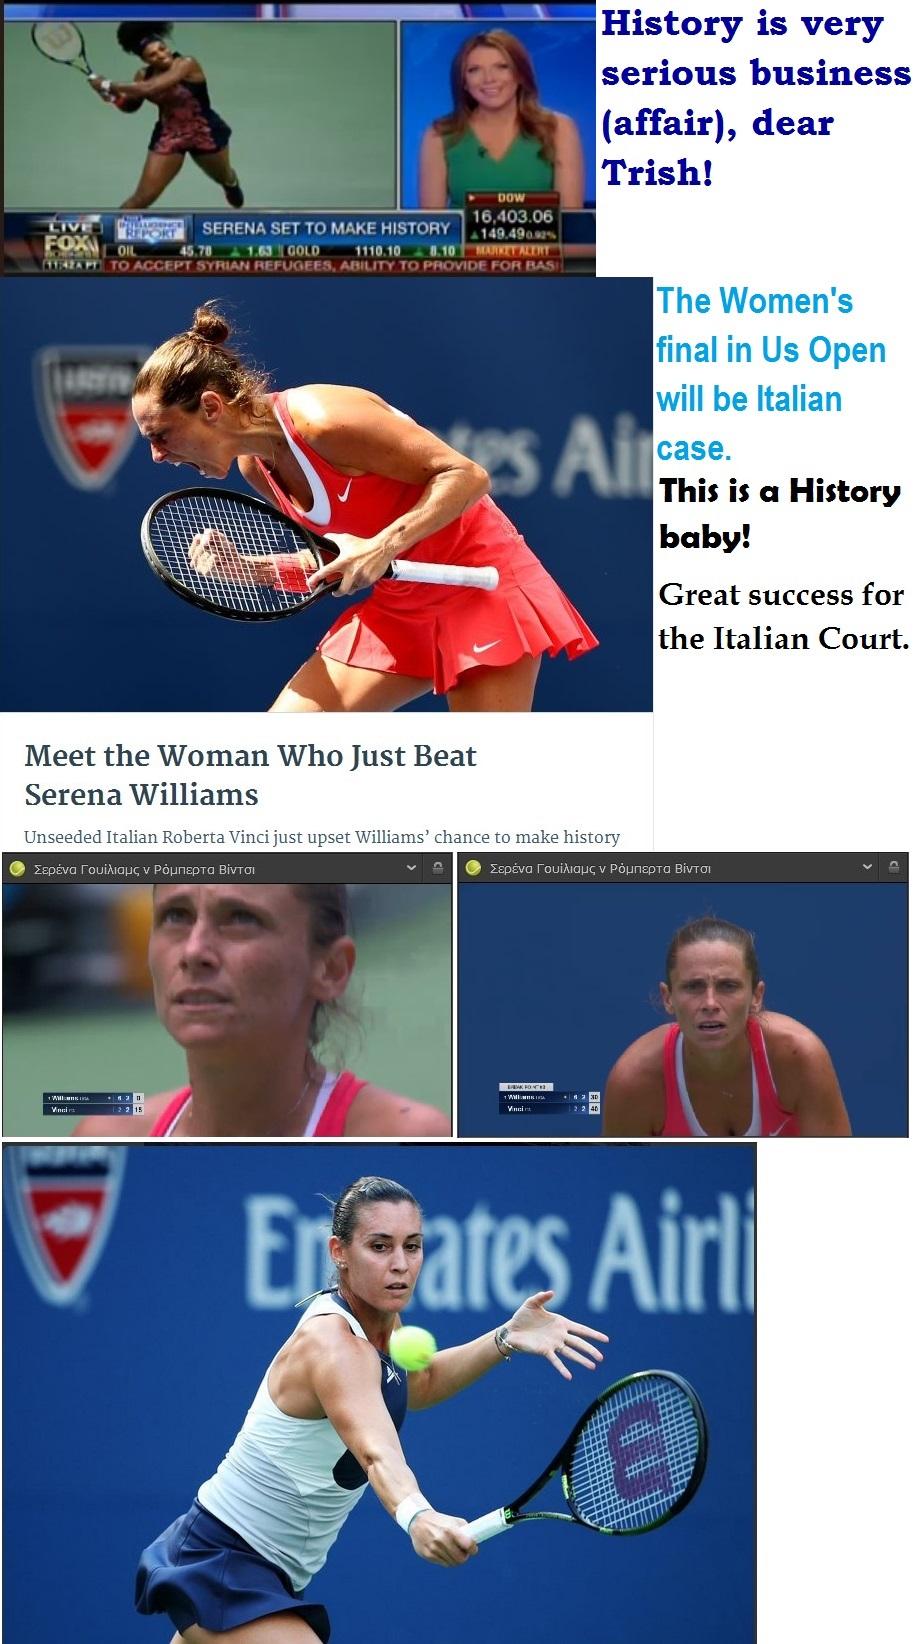 TENNIS USA GRAND SLAM OPEN US WOMAN FINAL PENNETTA VS VINCI 01 120915